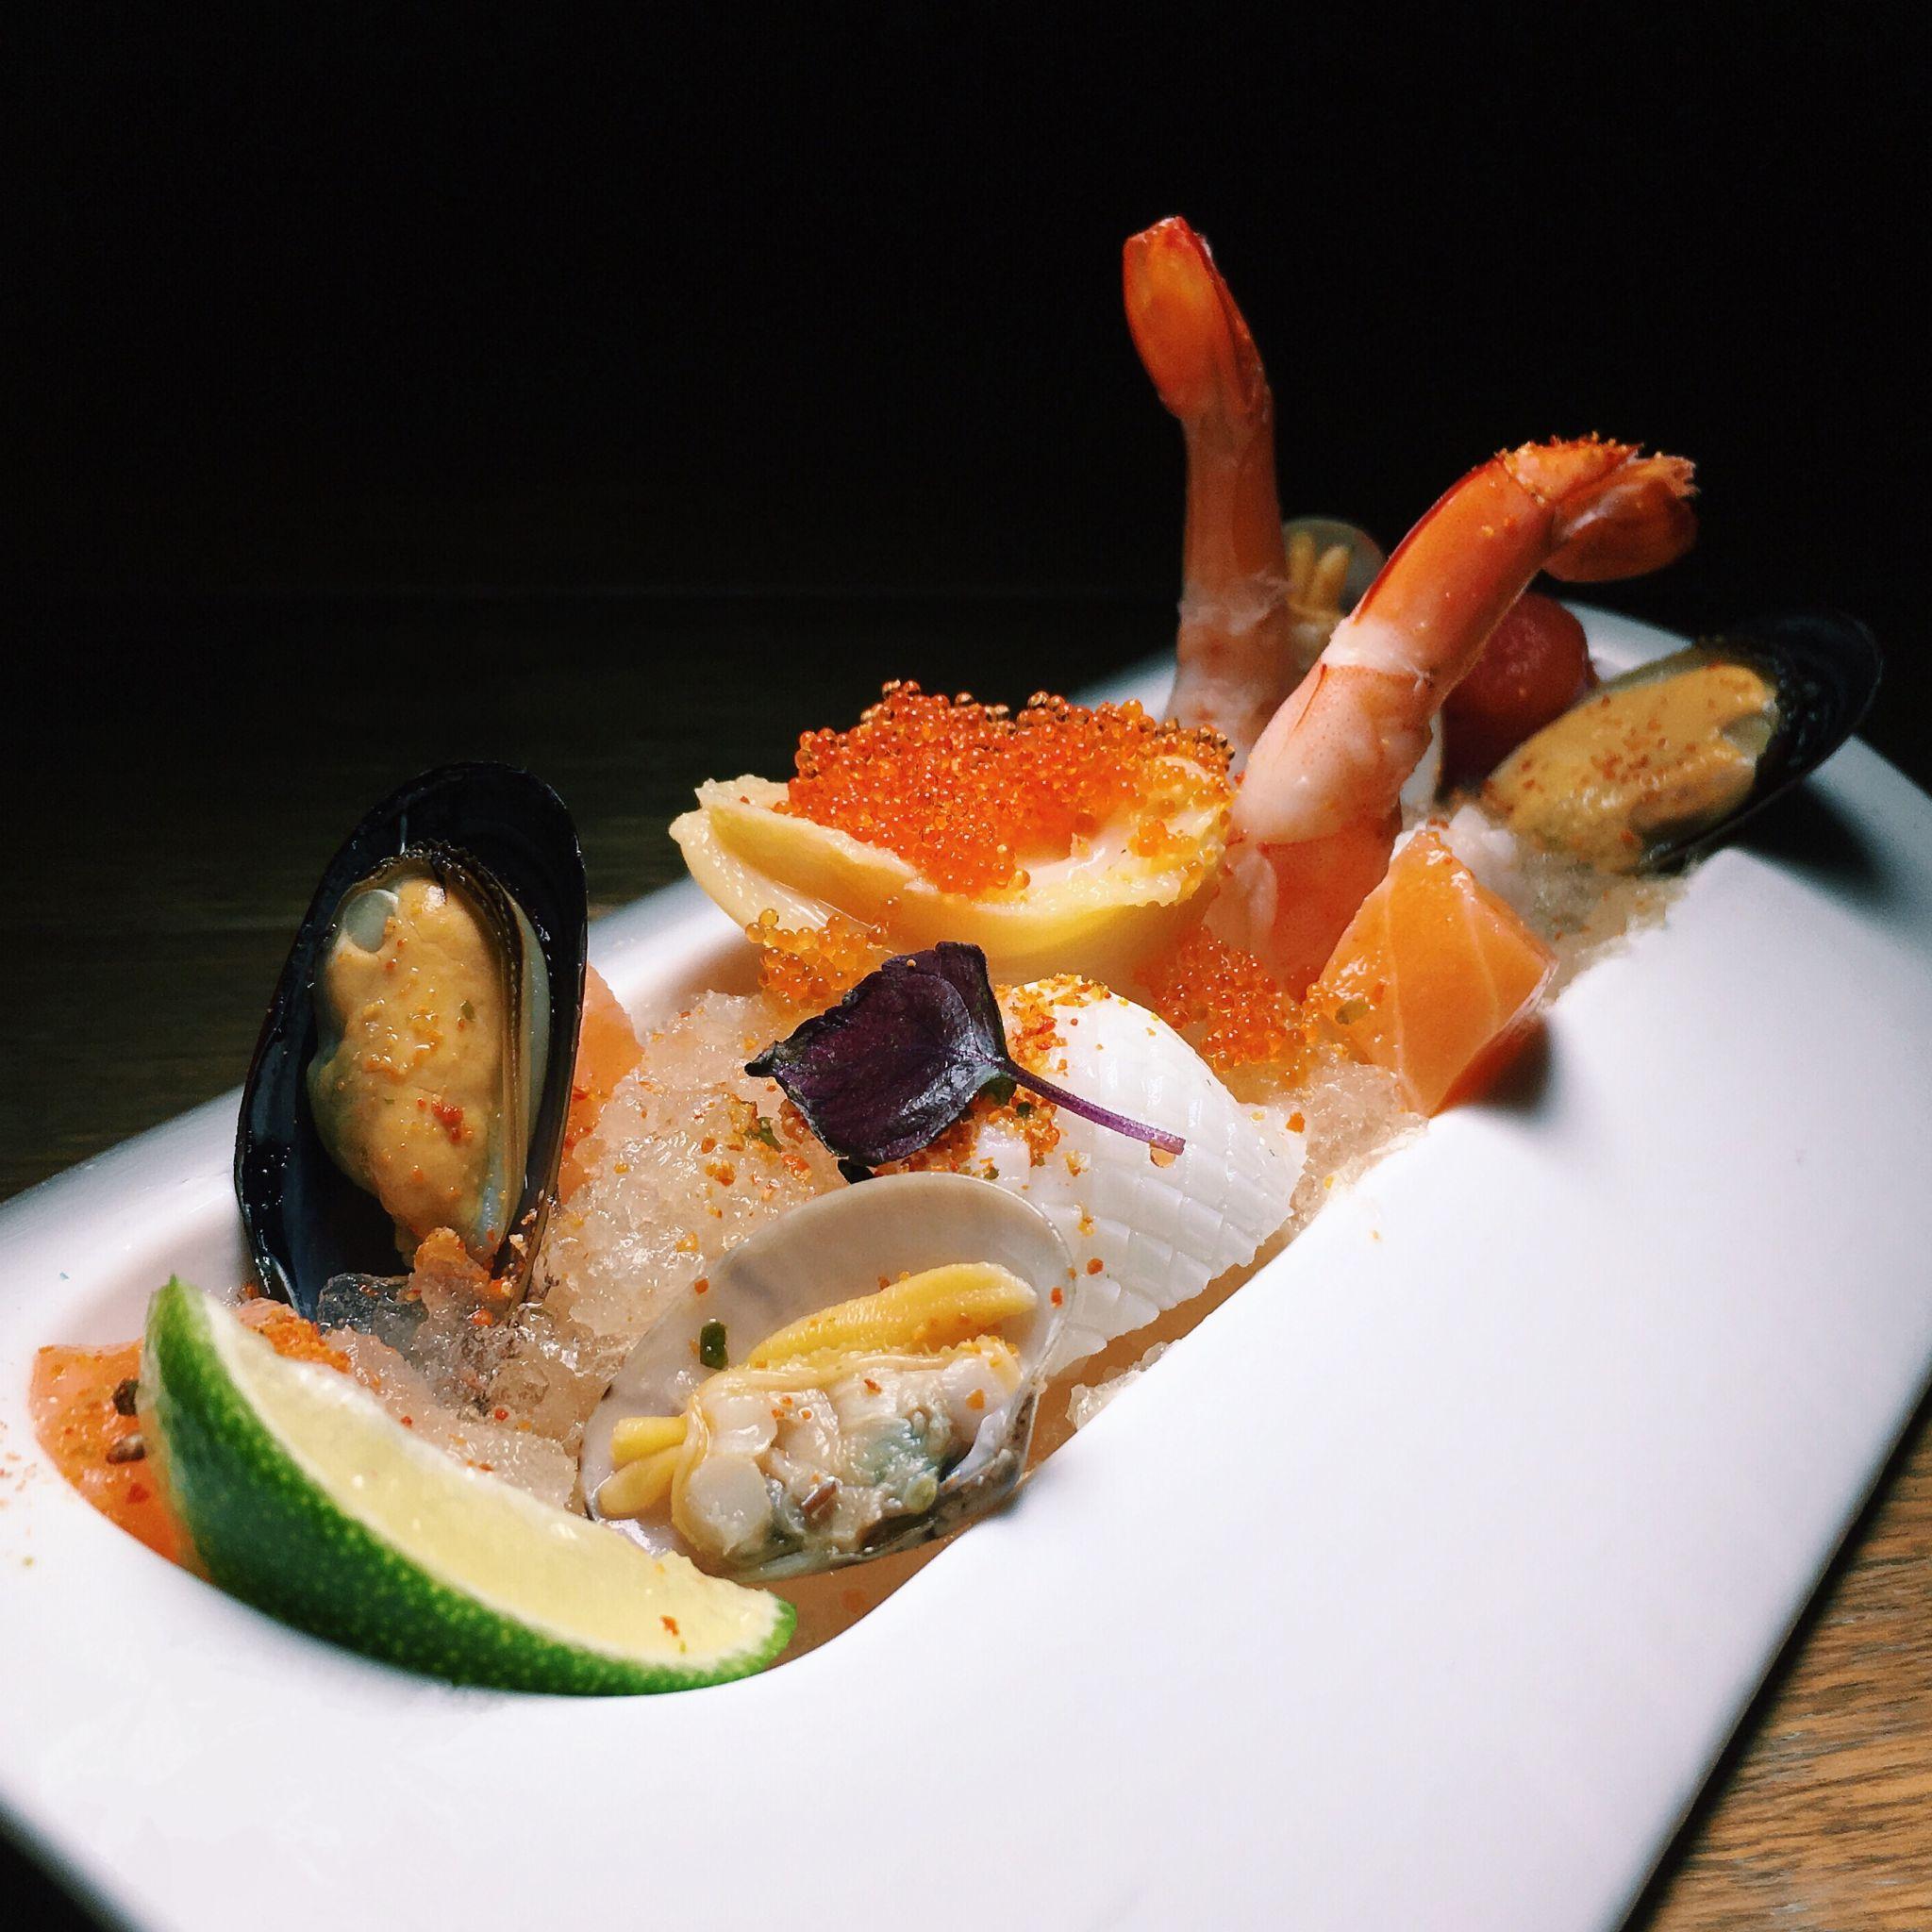 Reinterpreted Seafood Tom Yum Goong On Ice - The East Bureau